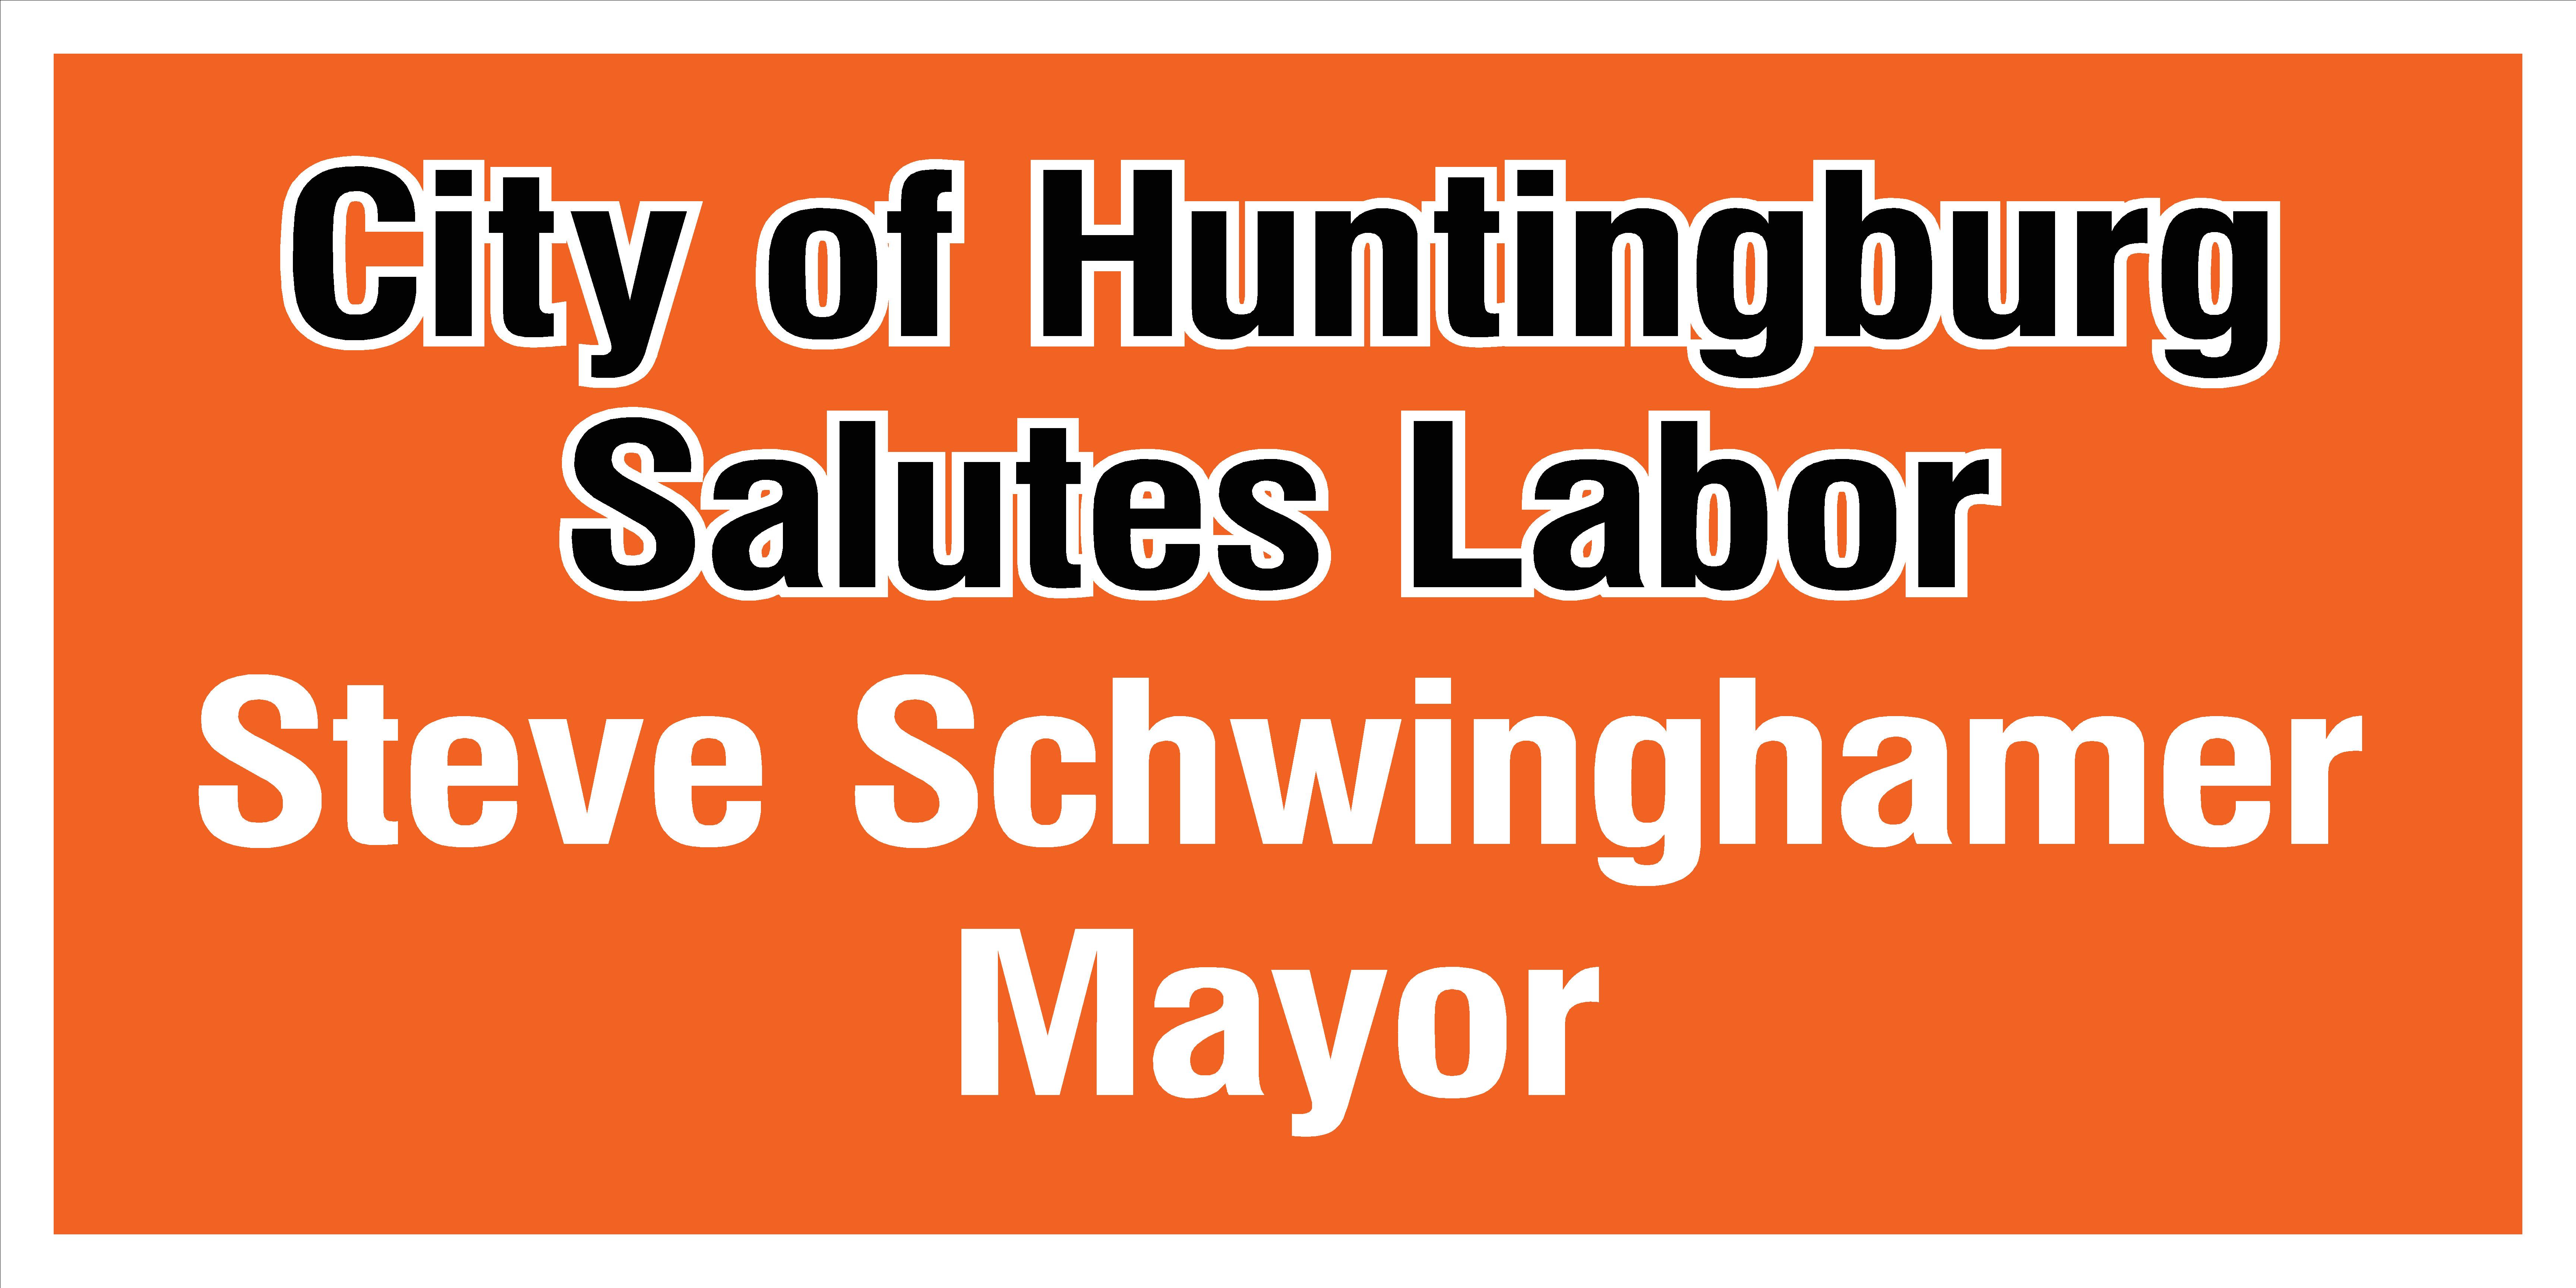 City-of-Huntingburg